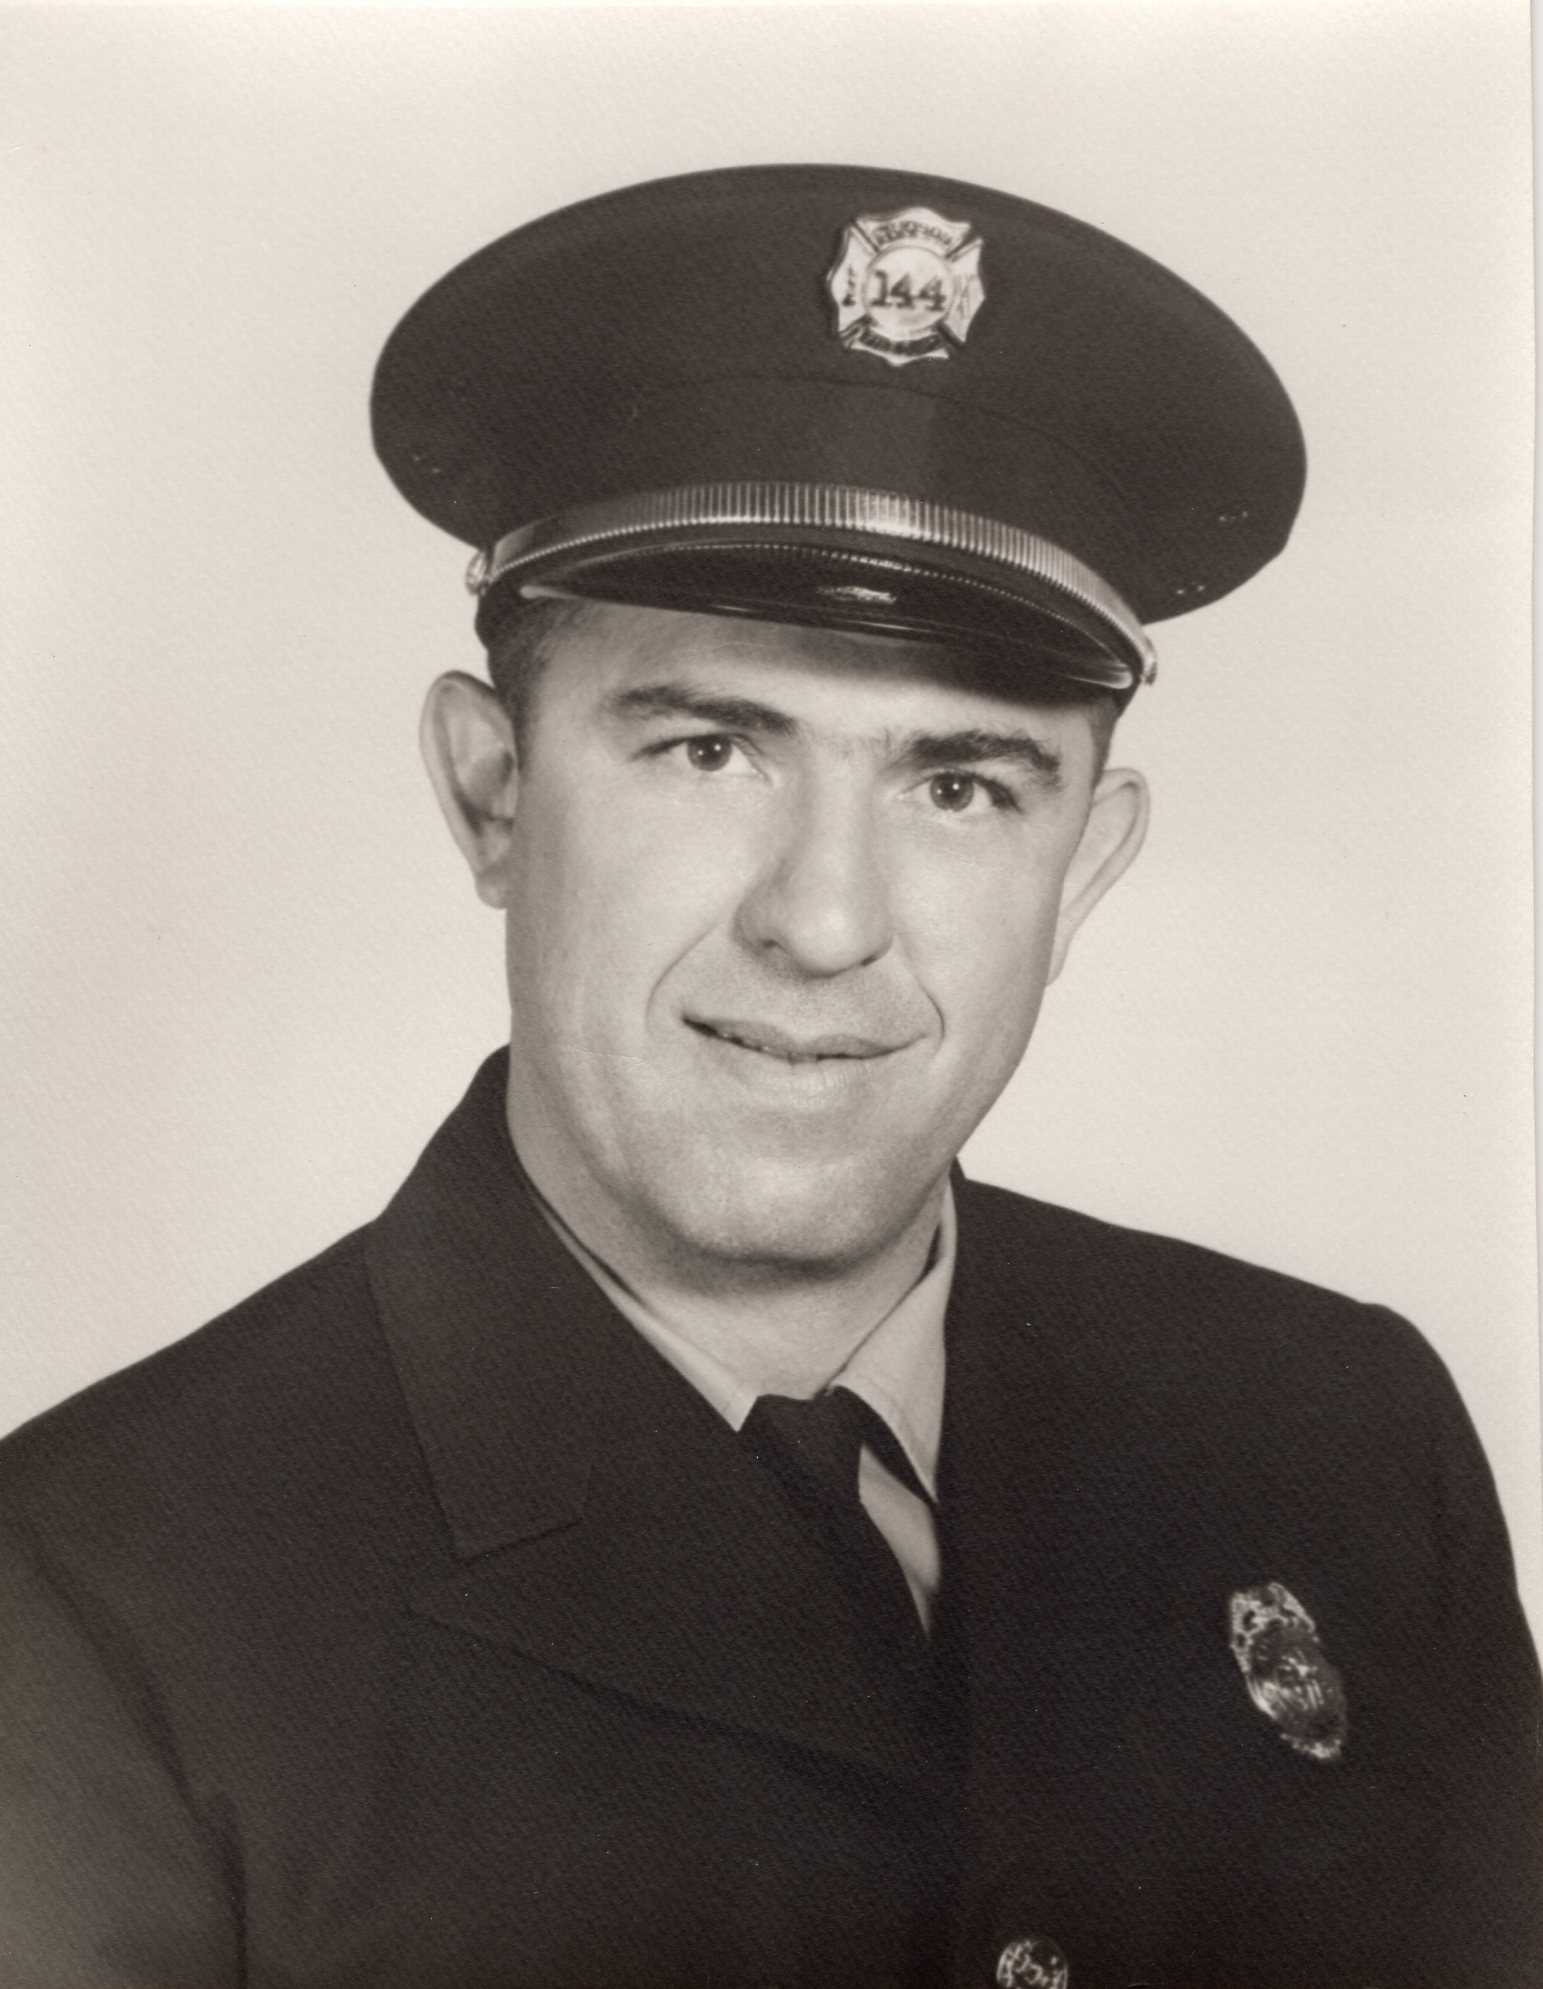 Randall Joseph Grable, age 90, of Prescott, Arizona